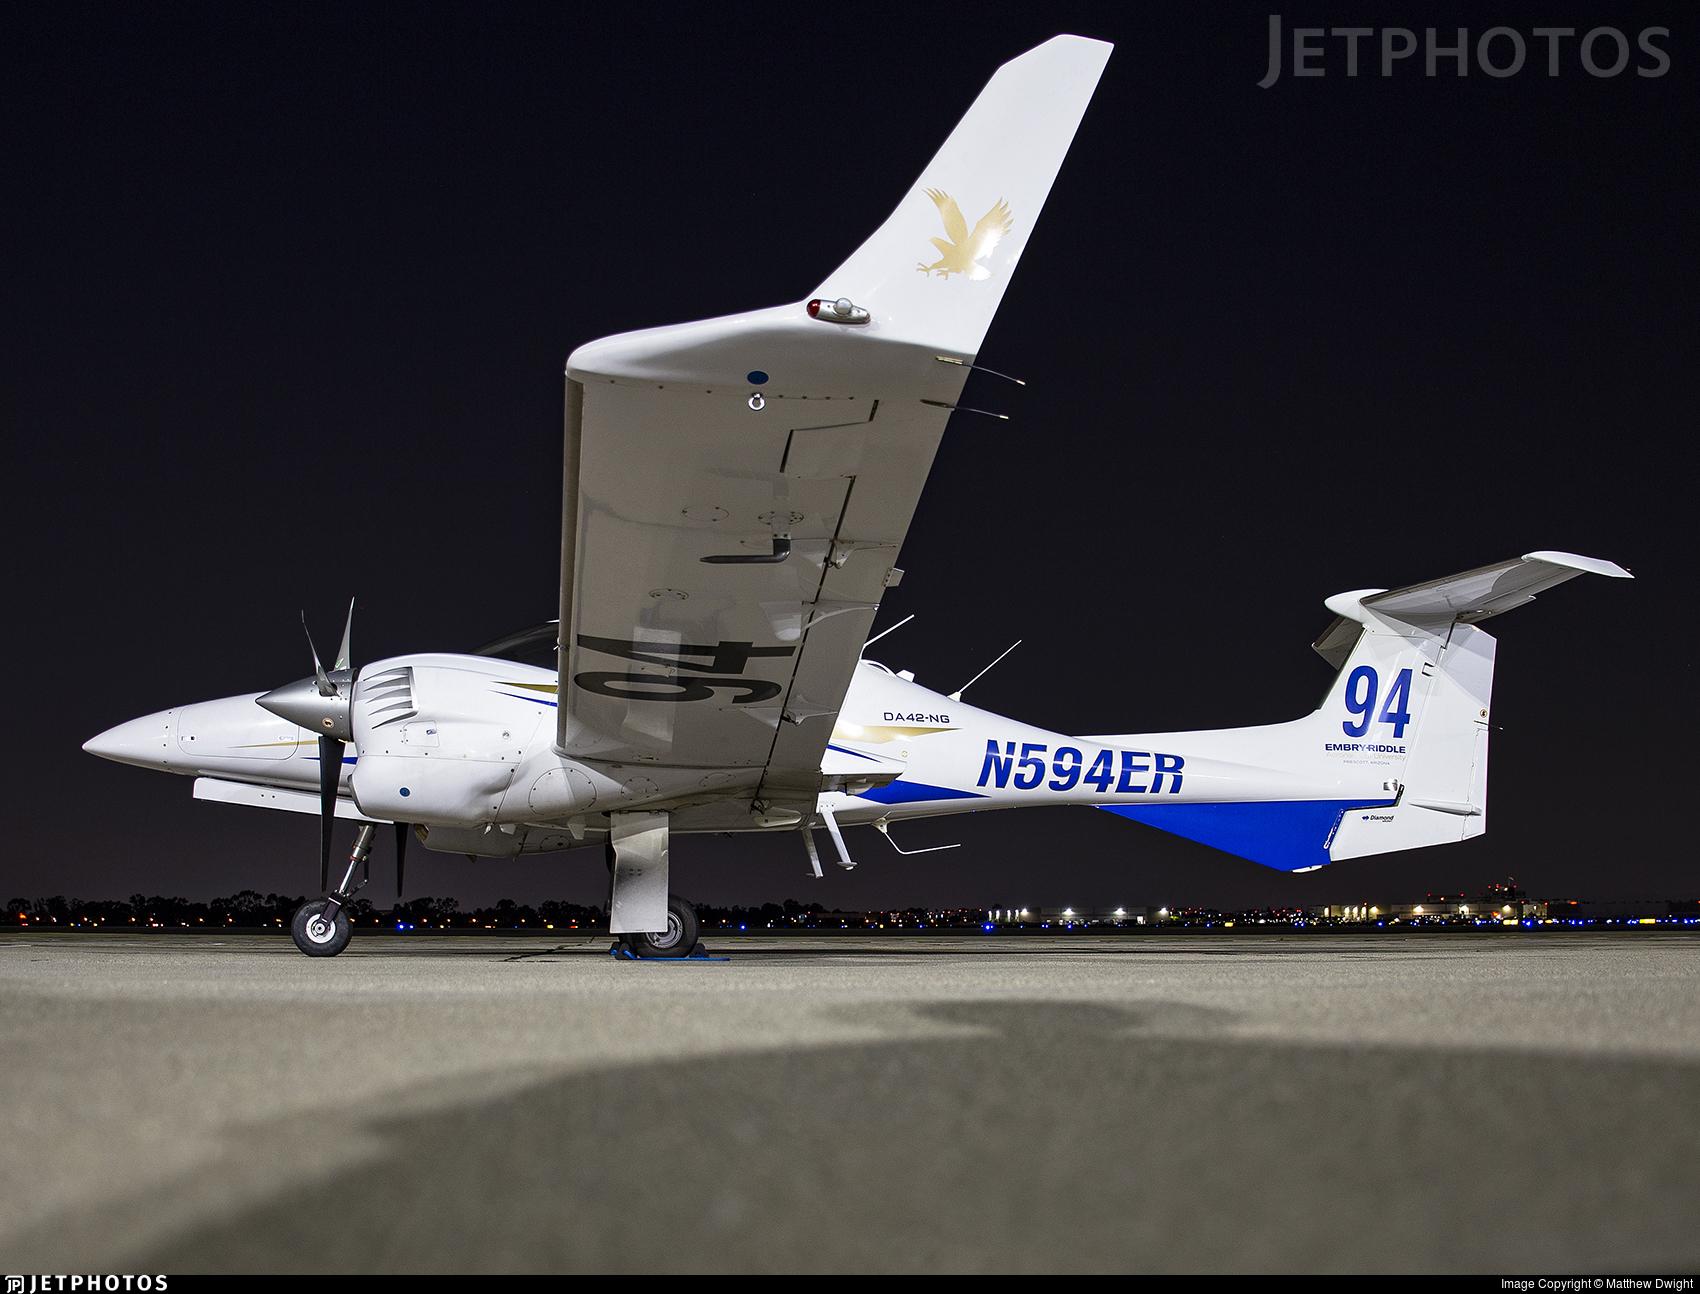 N594ER - Diamond DA-42 NG Twin Star - Embry-Riddle Aeronautical University (ERAU)